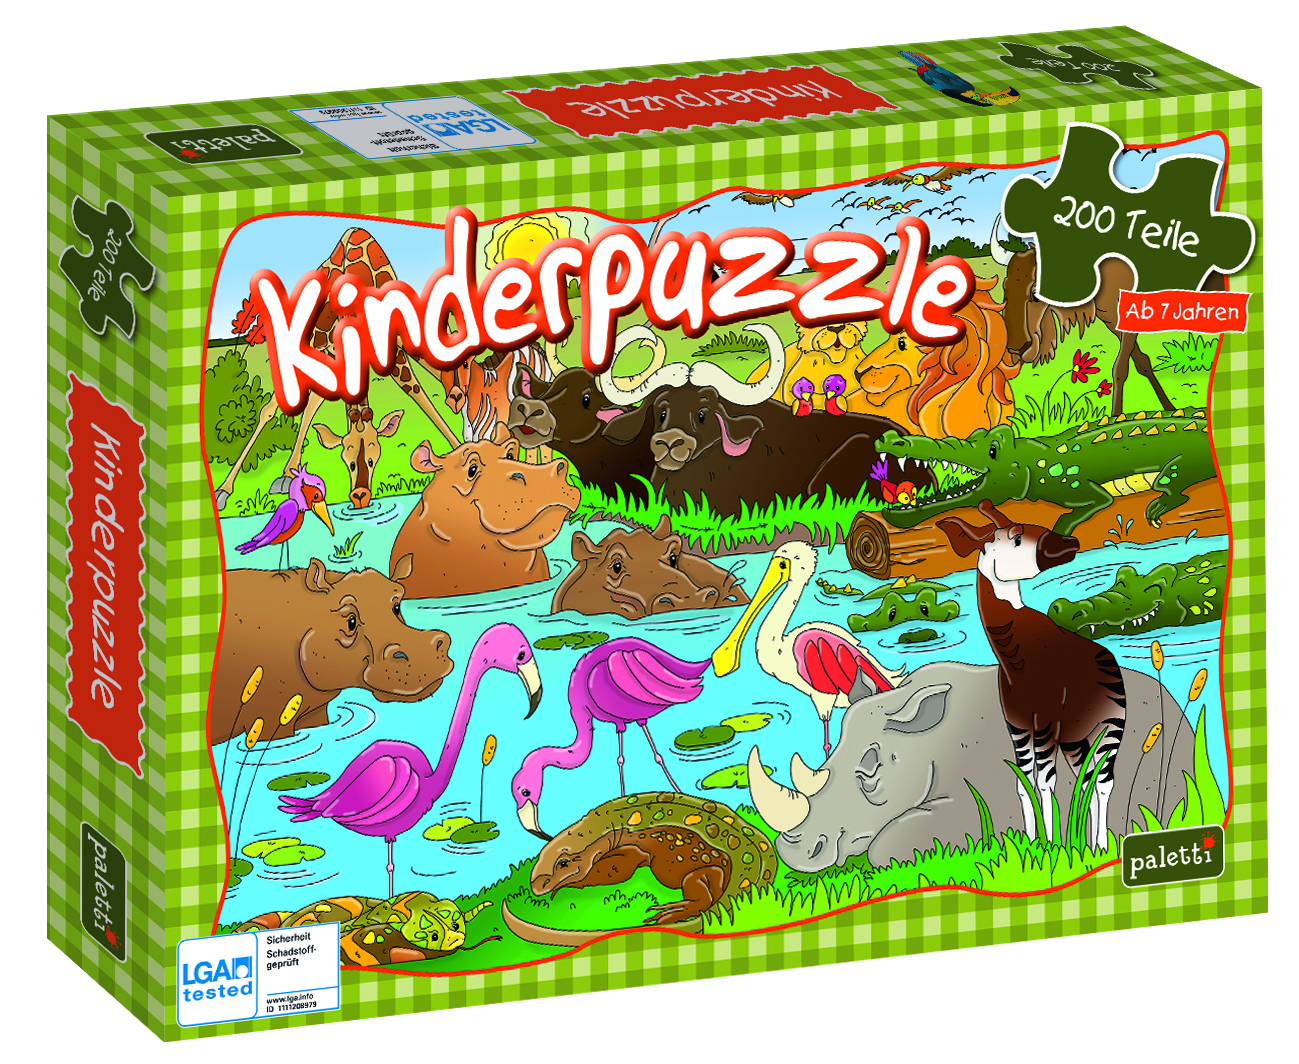 Paletti Puzzle Staffel1 Safari